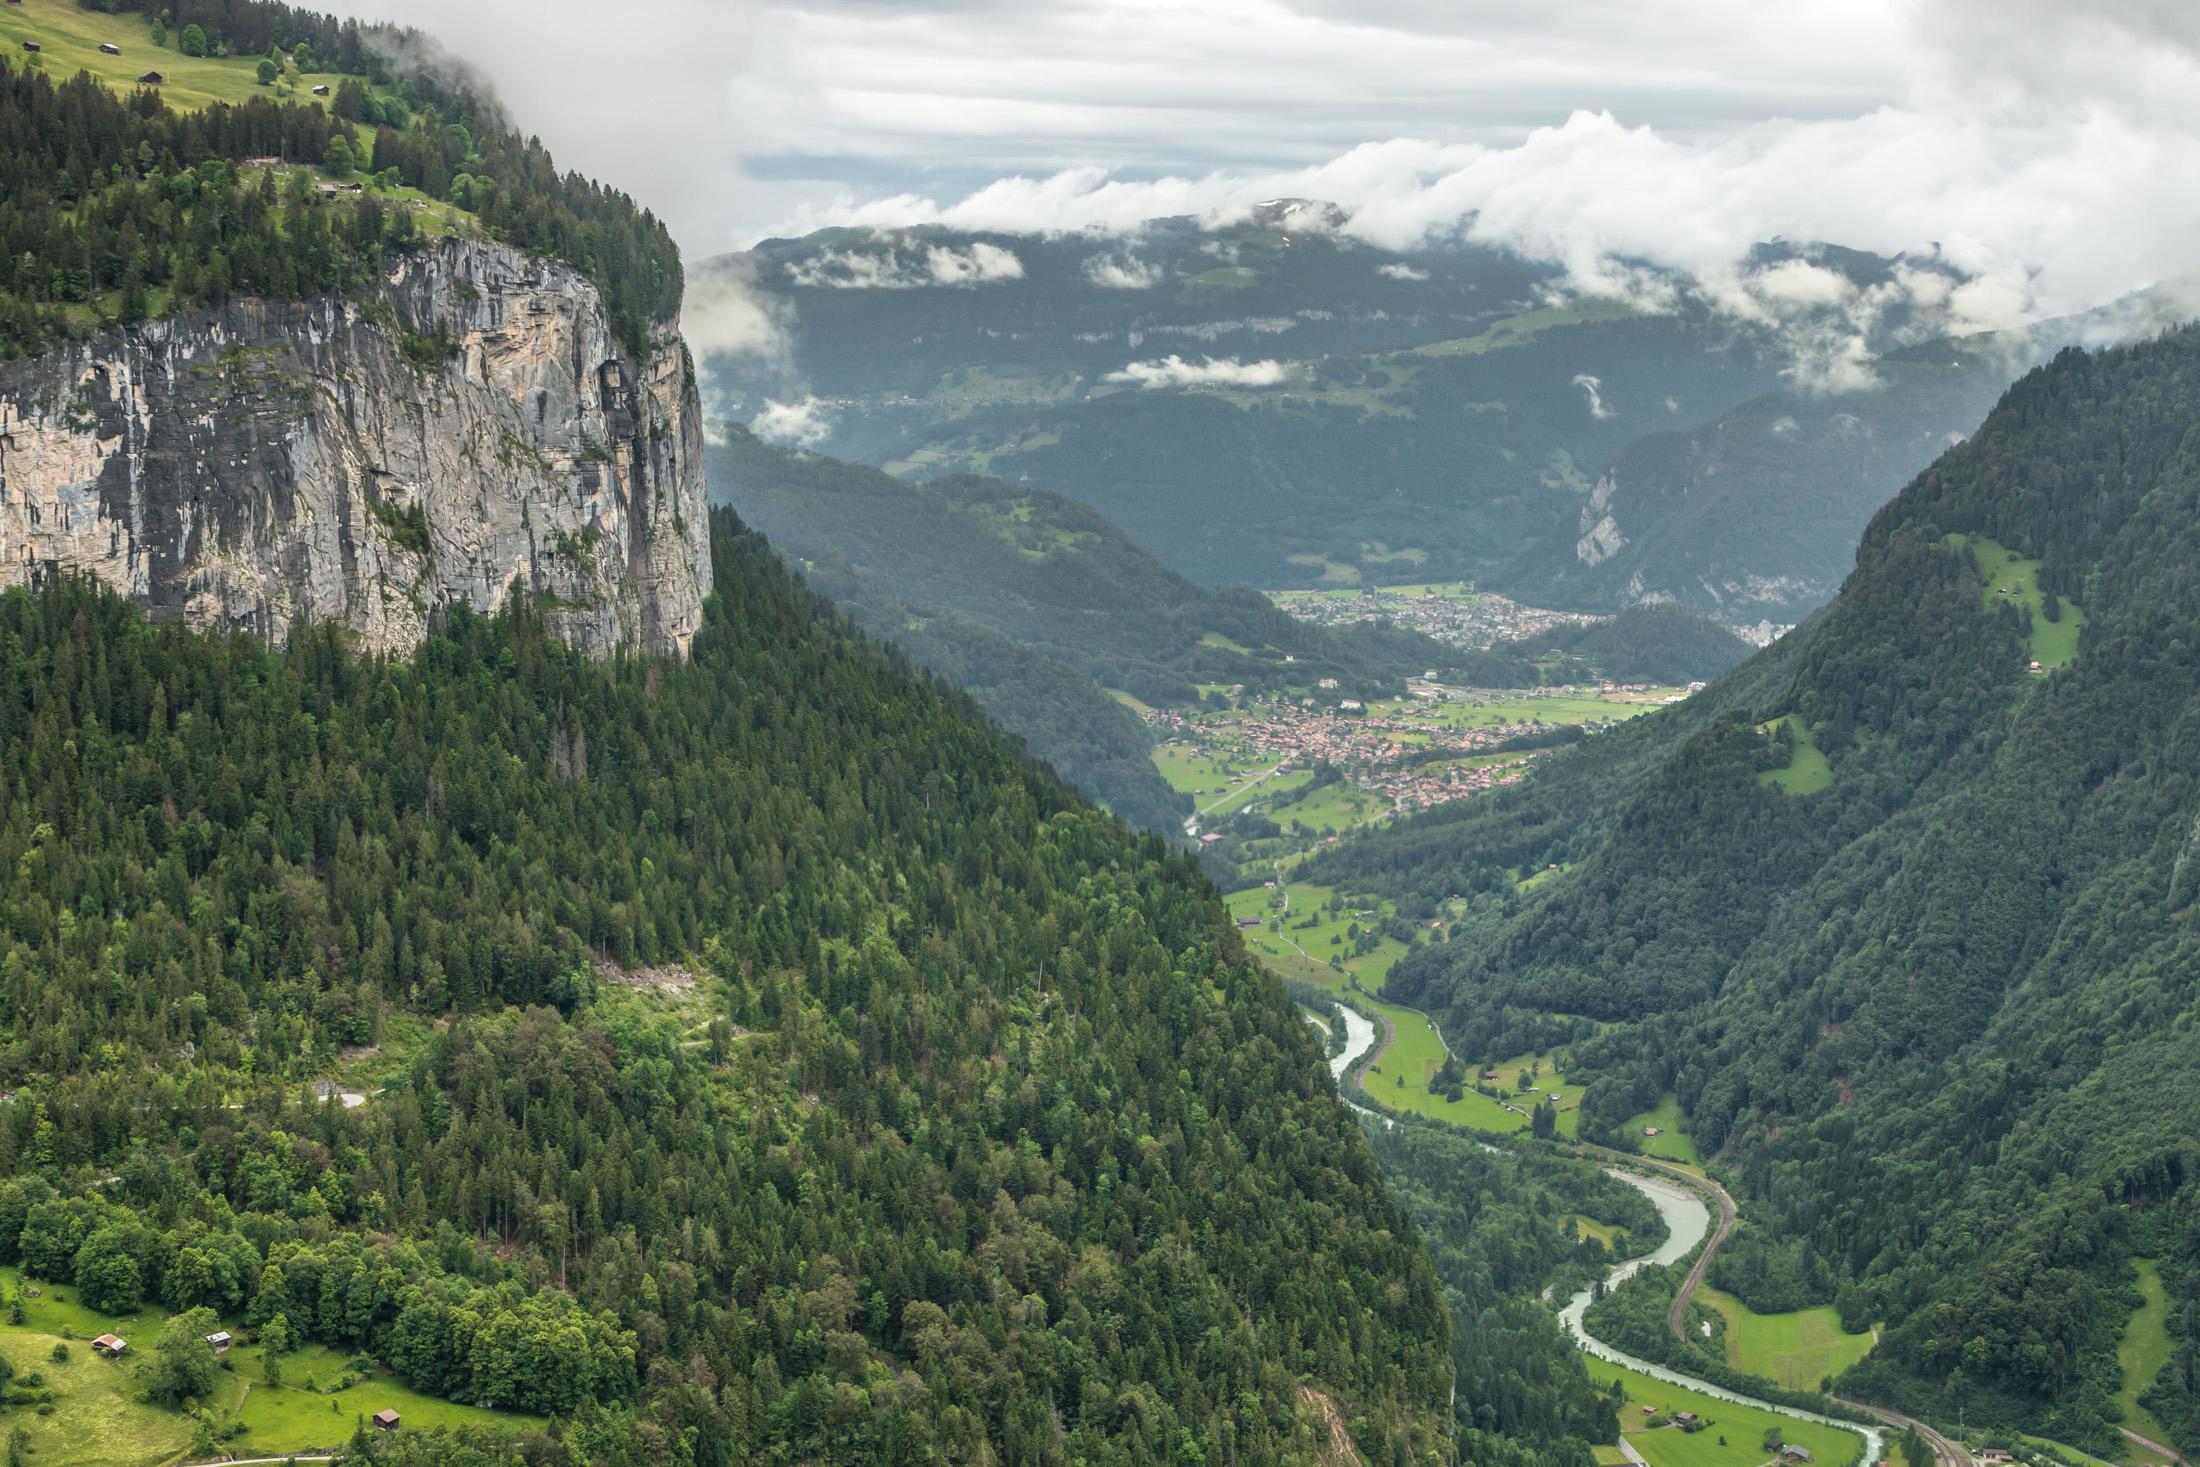 Dolina lauterbrunner